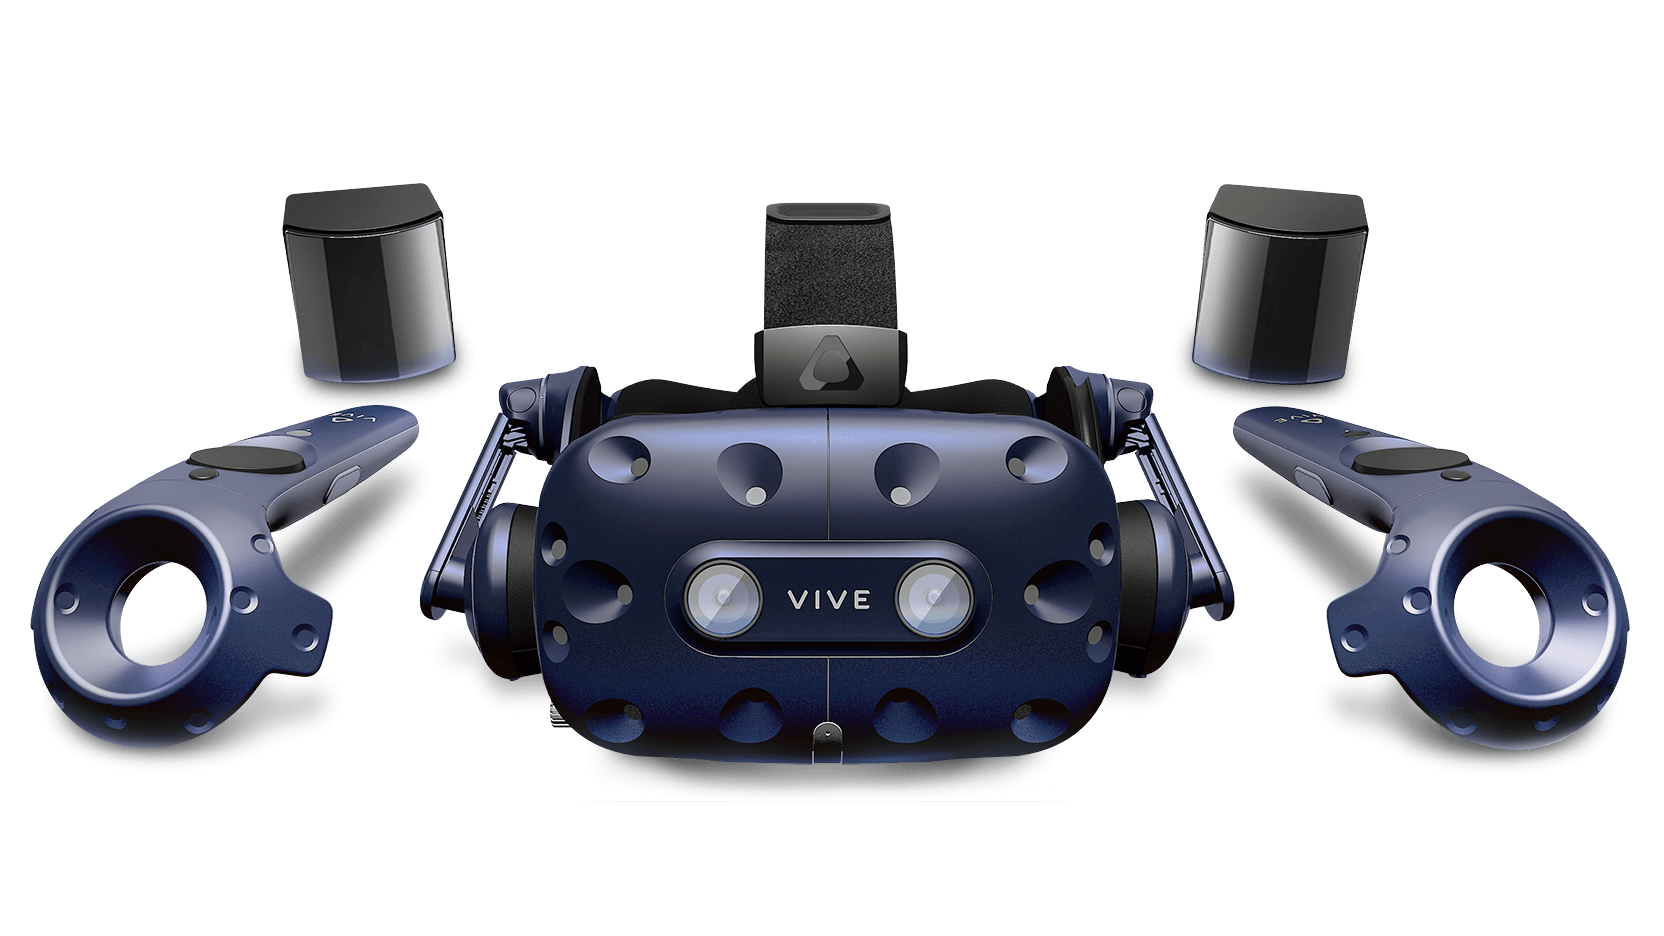 Шлем виртуальной реальности HTC VIVE PRO FULL KIT 2.0